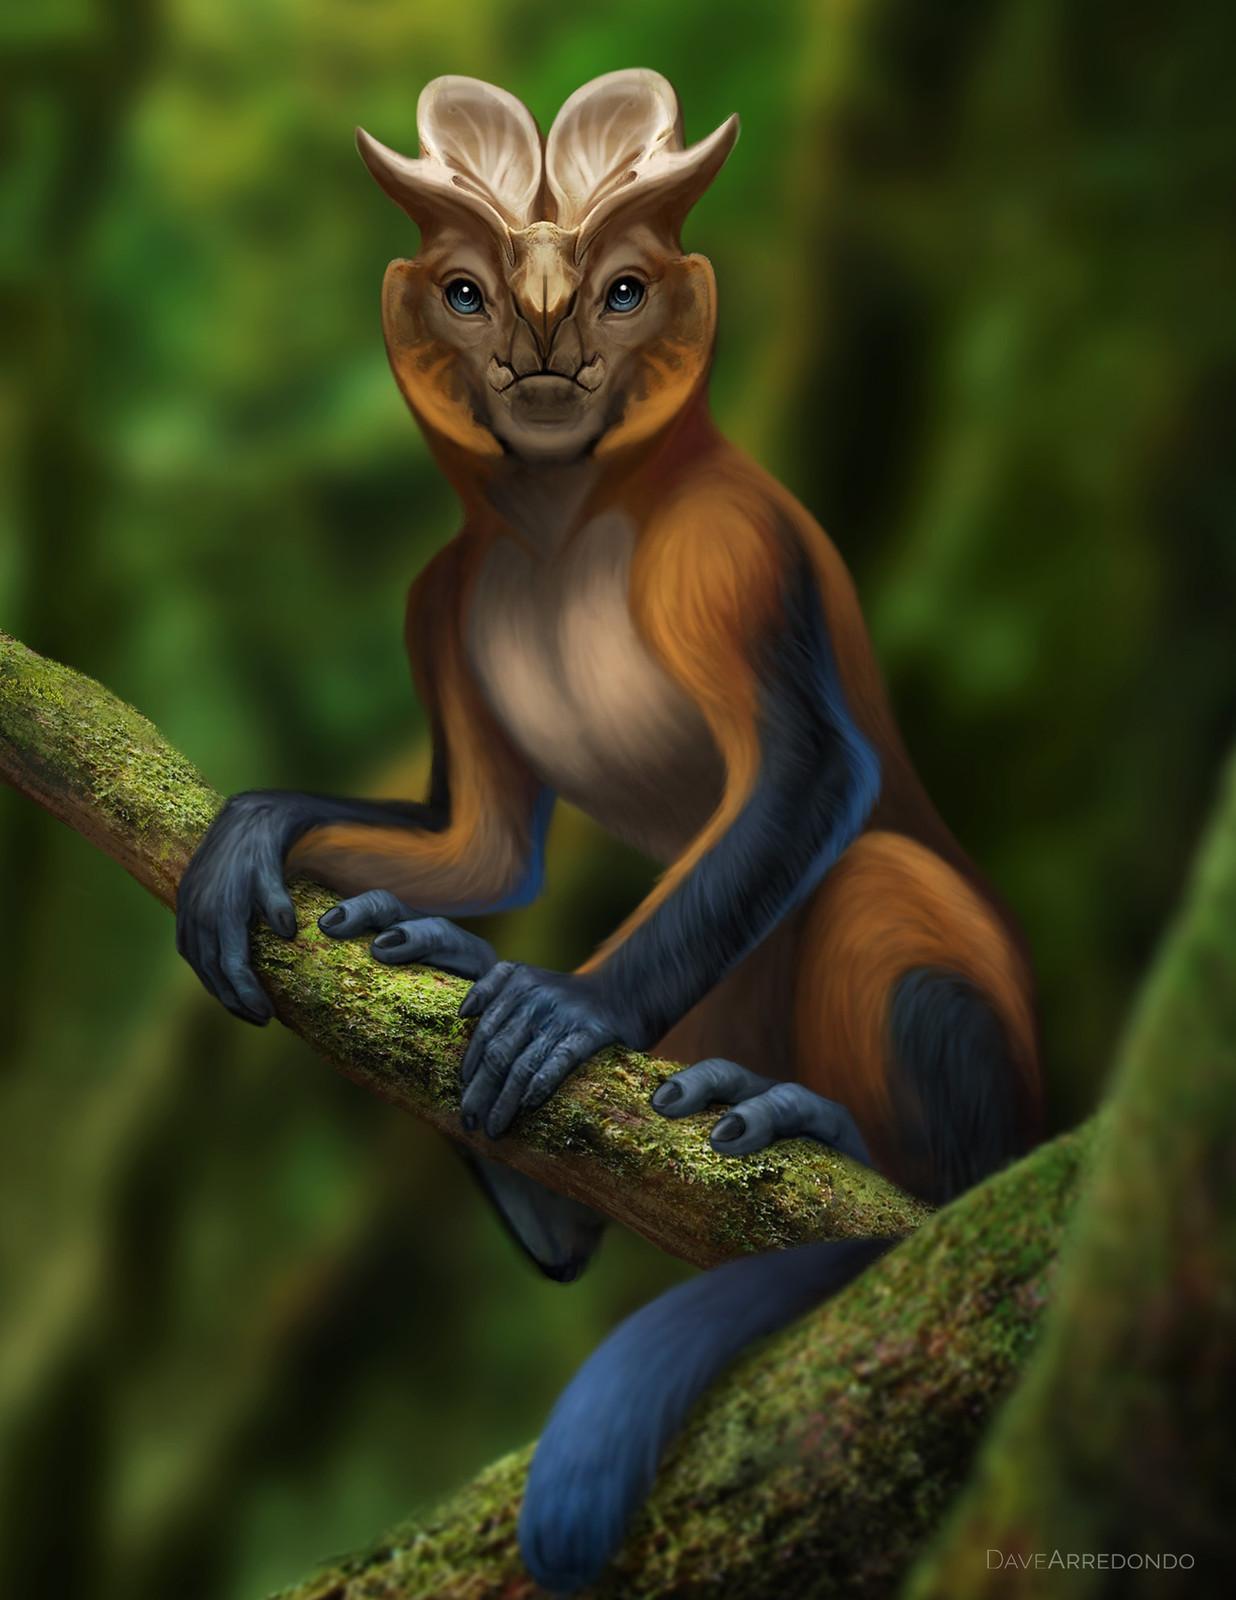 Horned Monkey of Zama